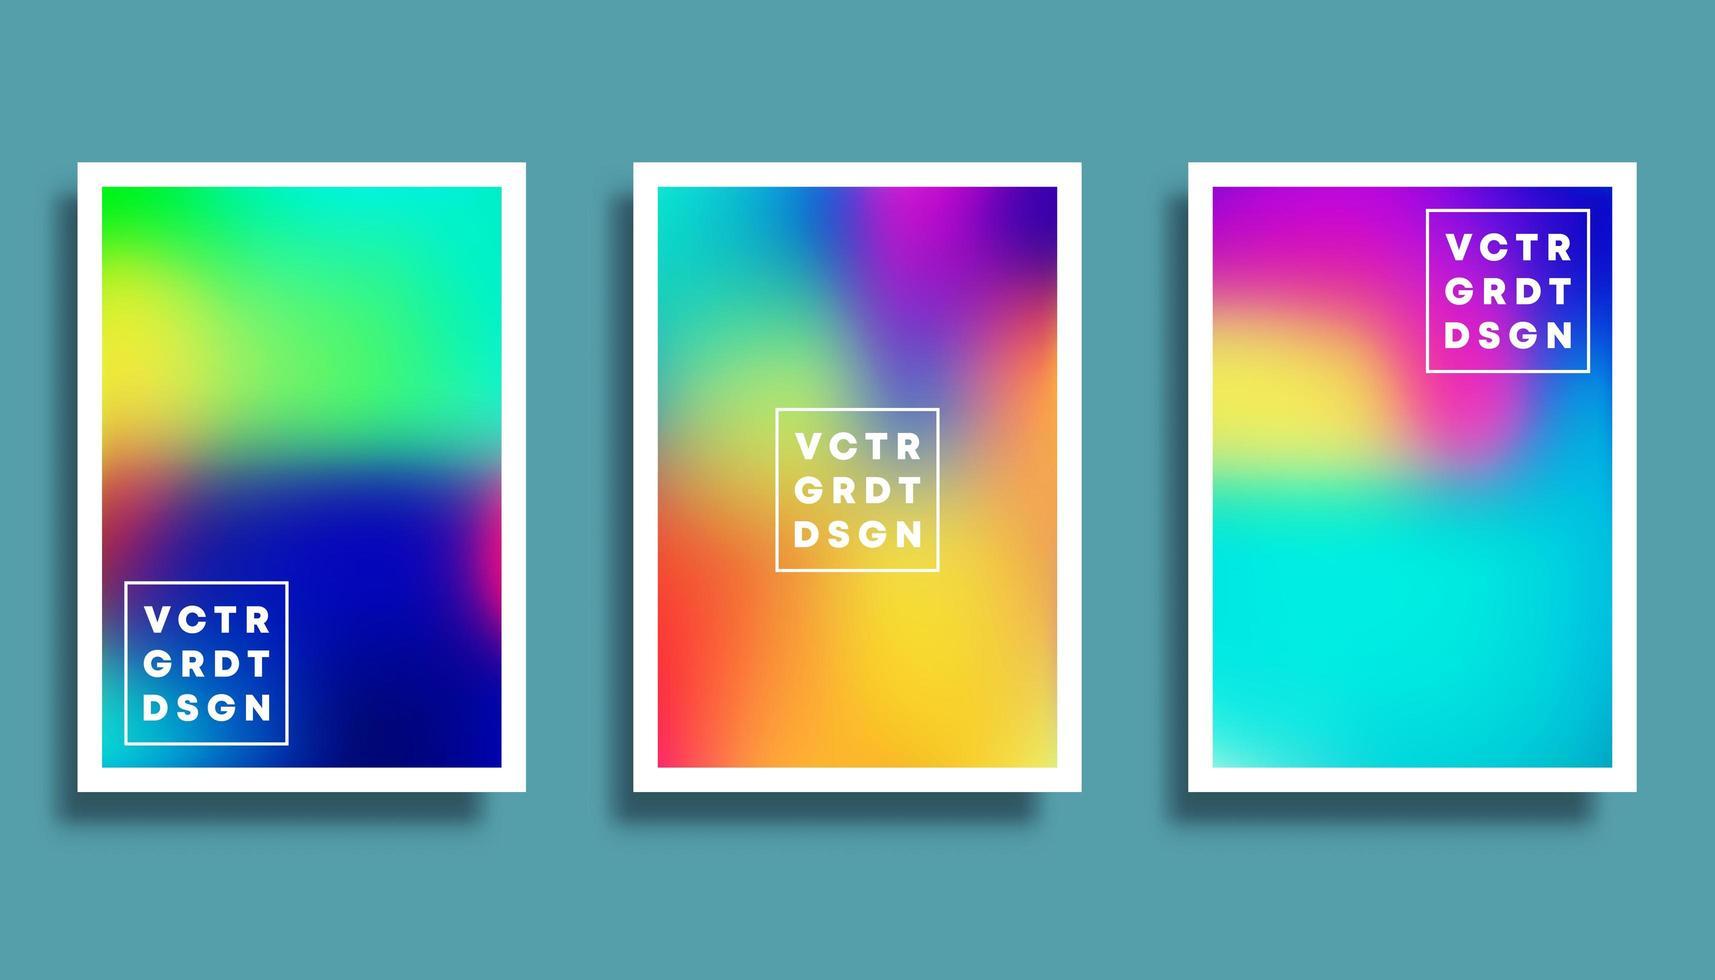 conjunto de fondos coloridos degradados borrosos vector